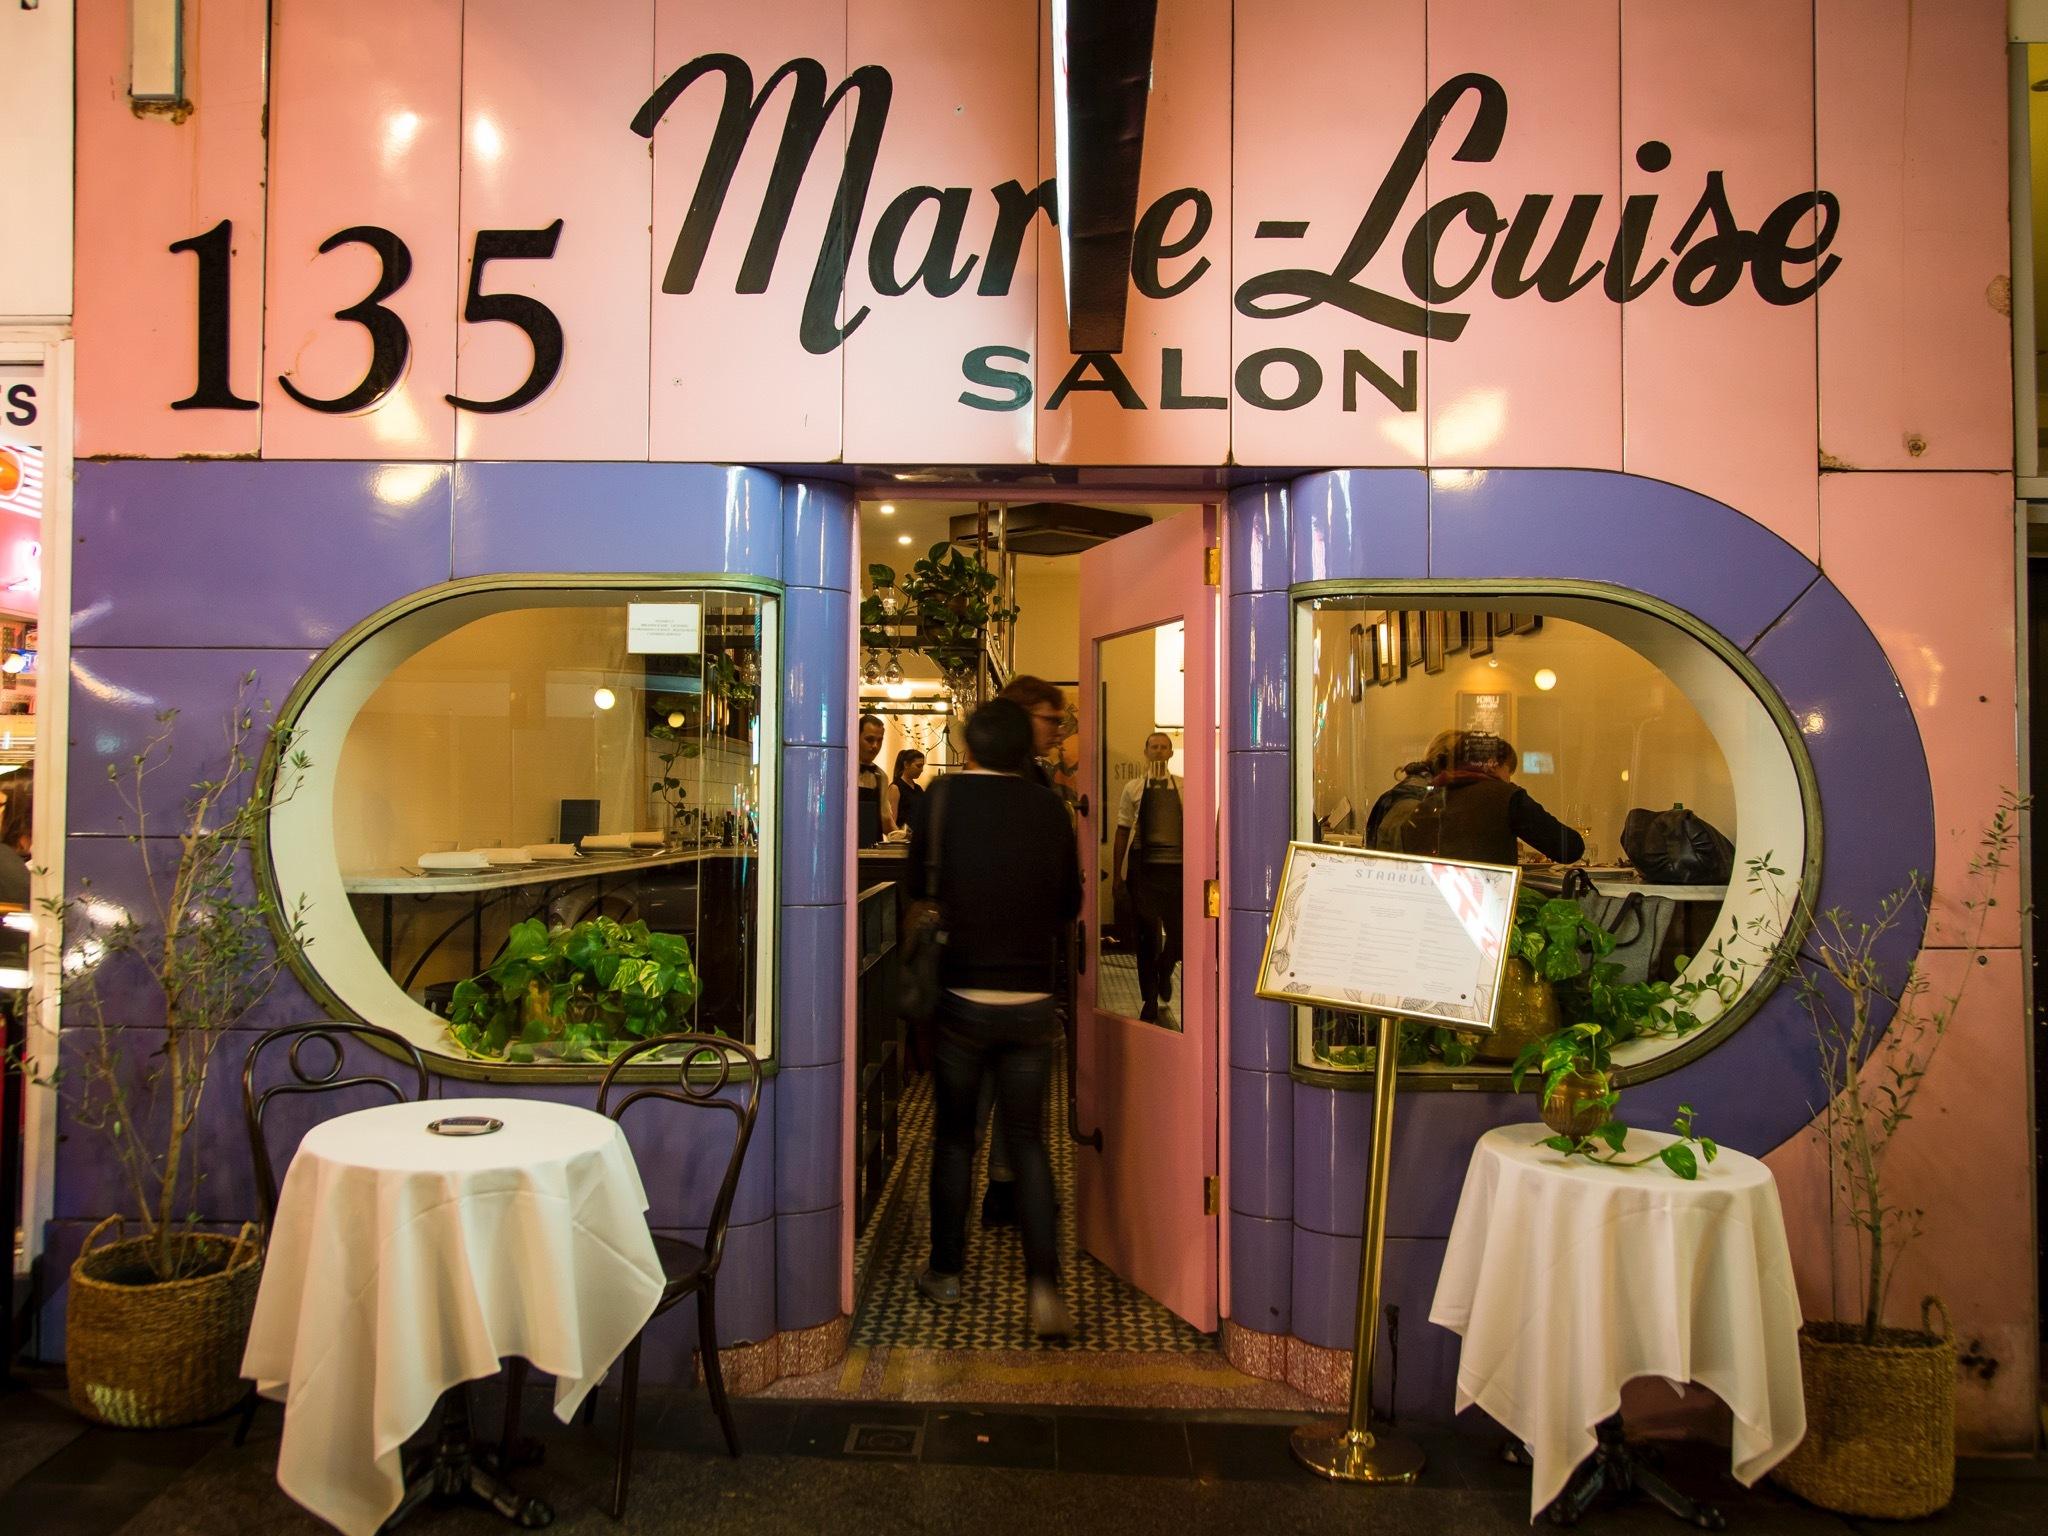 Exterior of the restaurant with a vintage hair salon facade